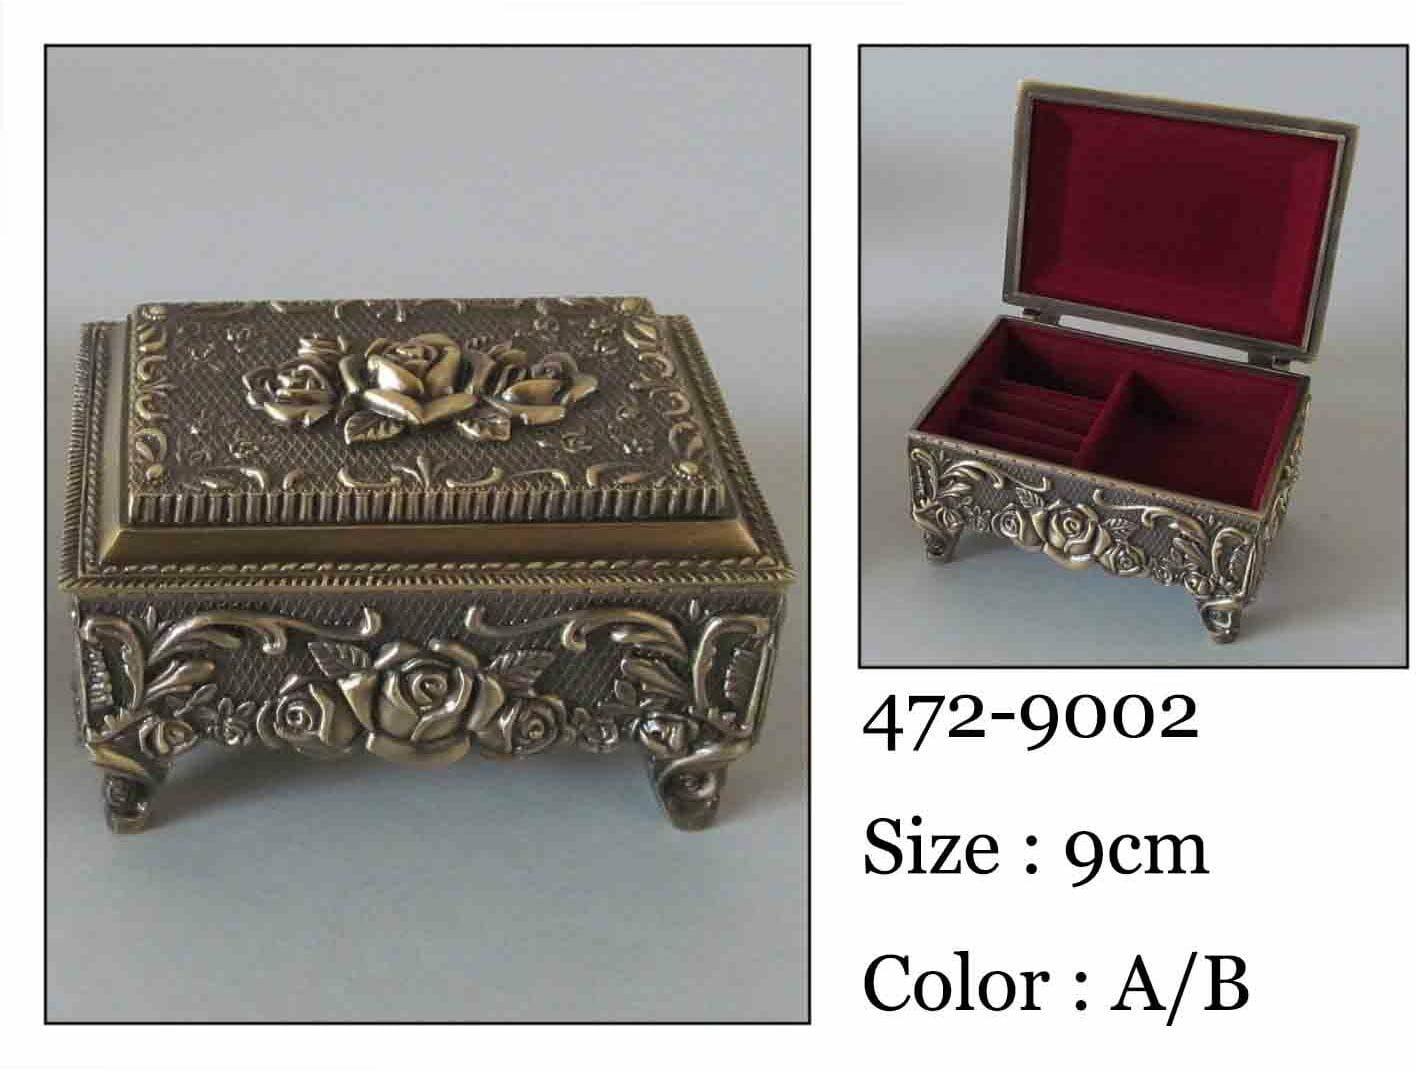 Kasetka, stare złoto, 9x6,5 cm